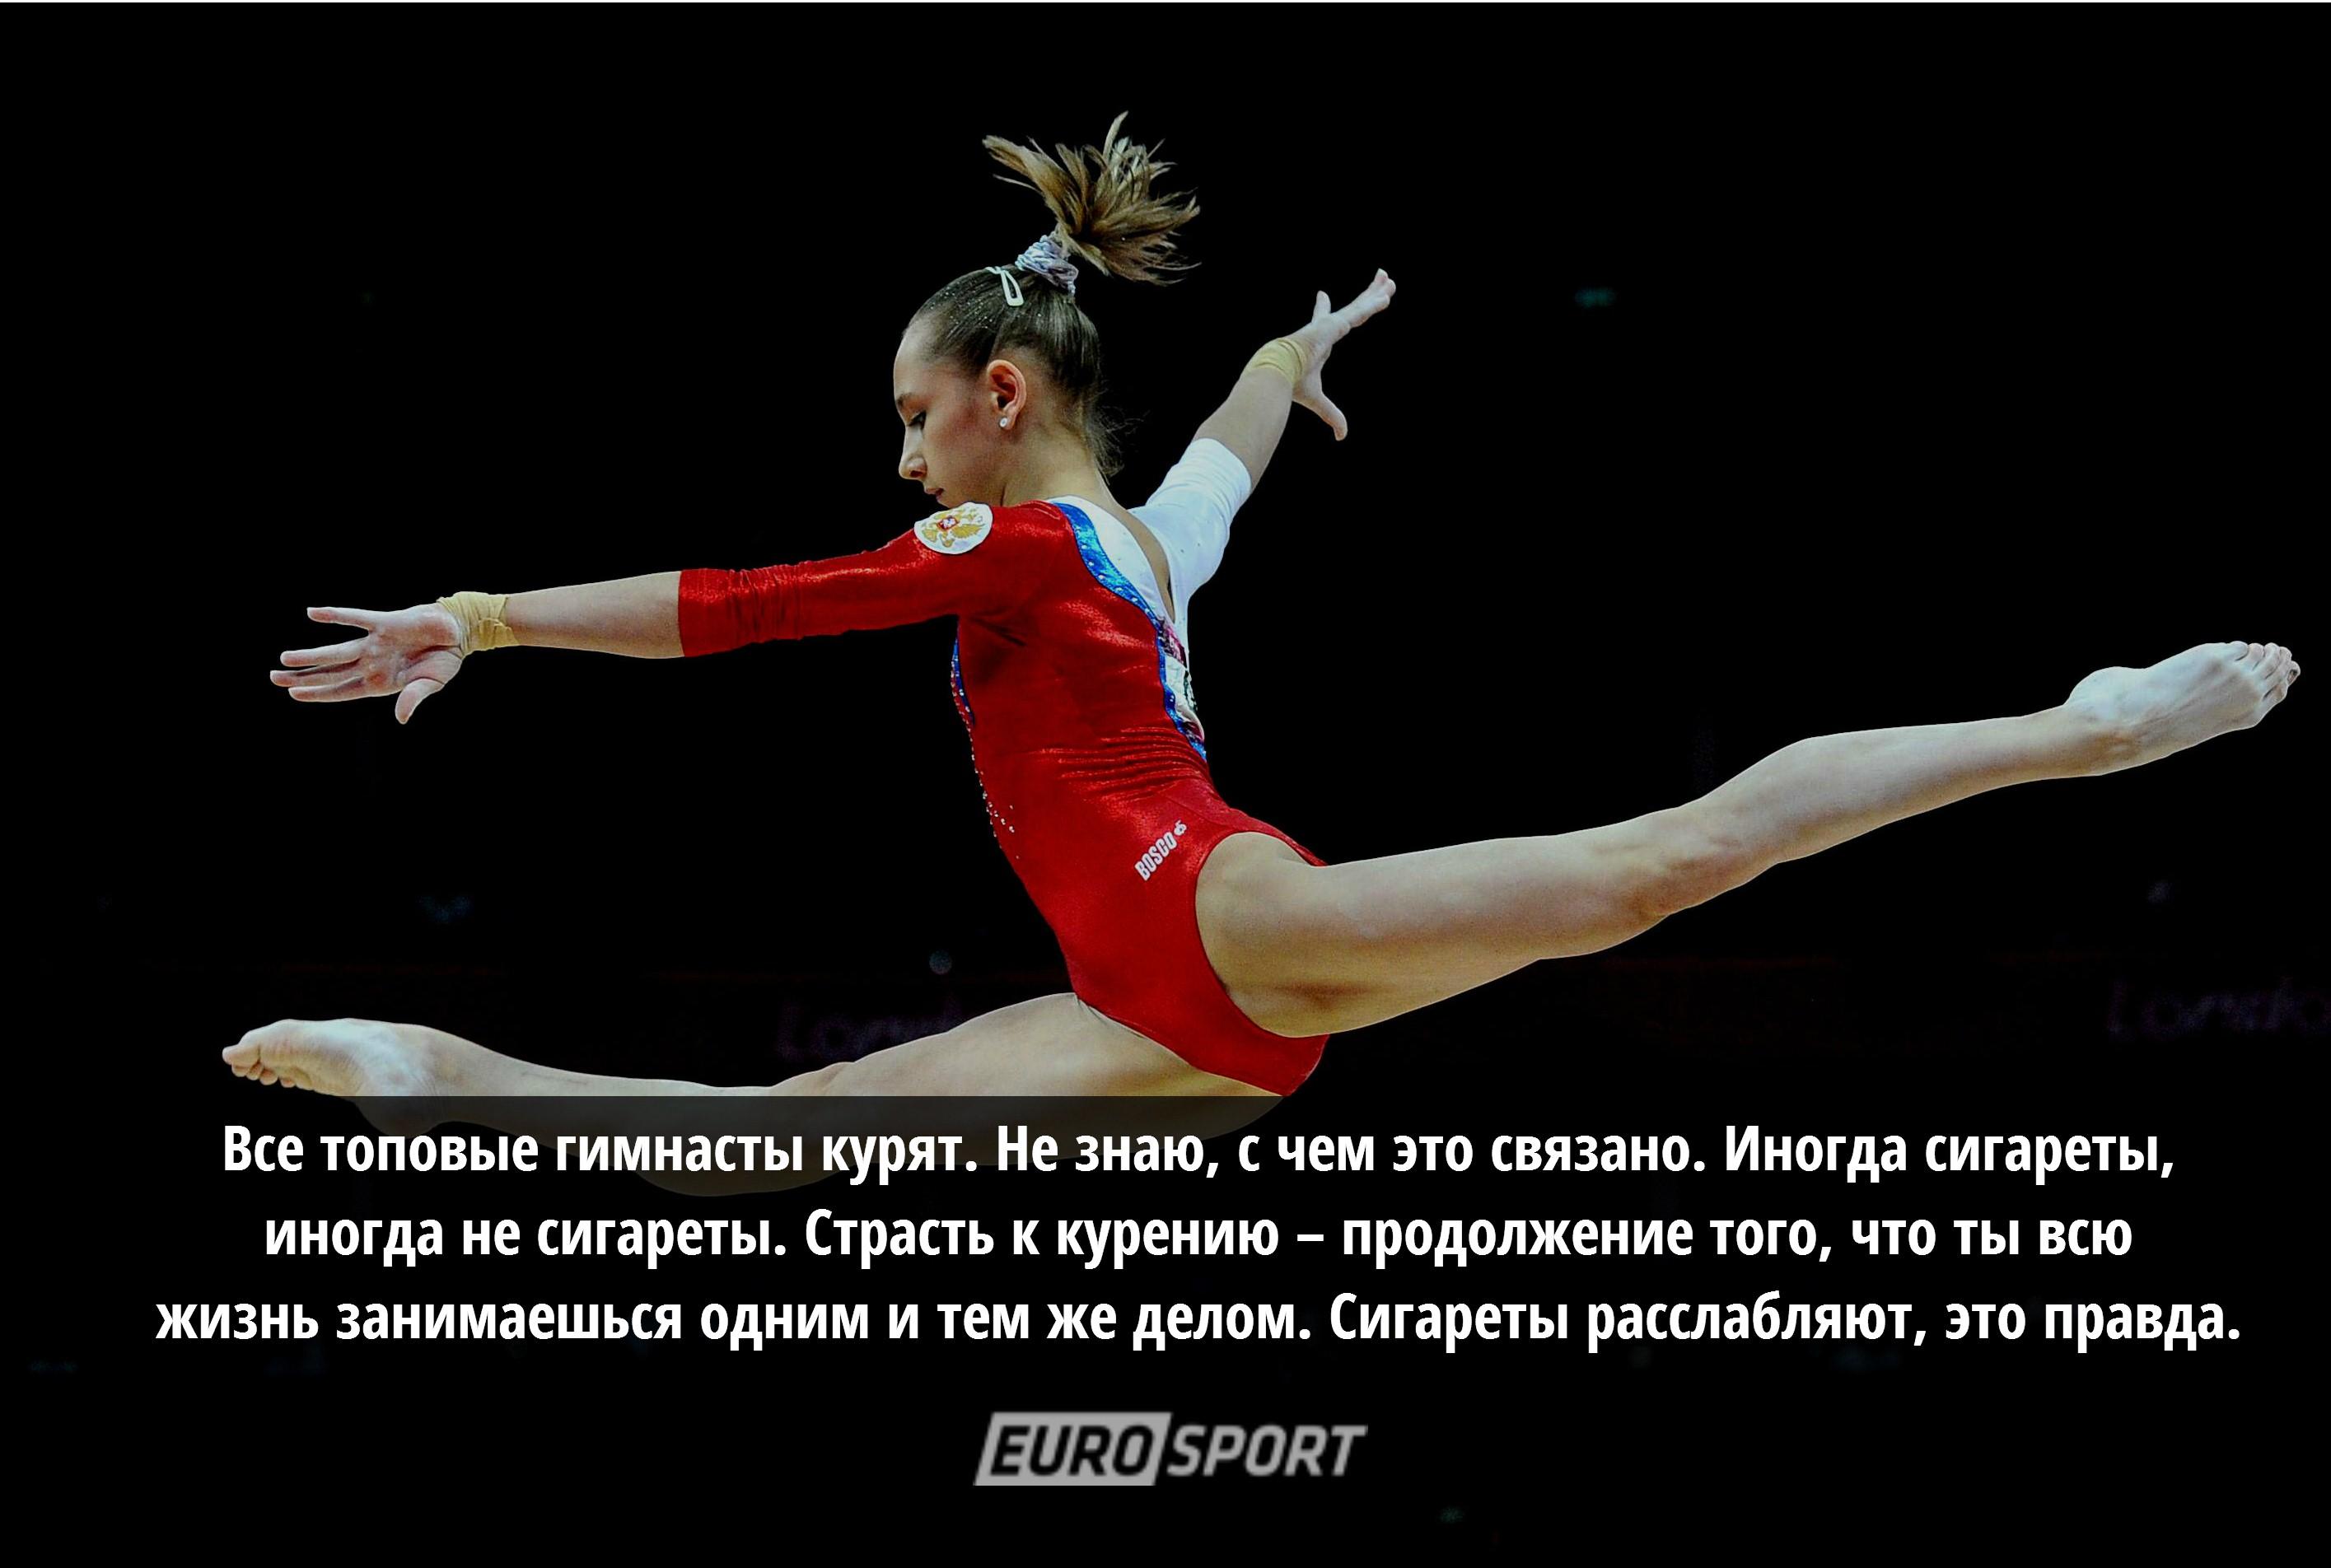 Спортивная гимнастика и секс